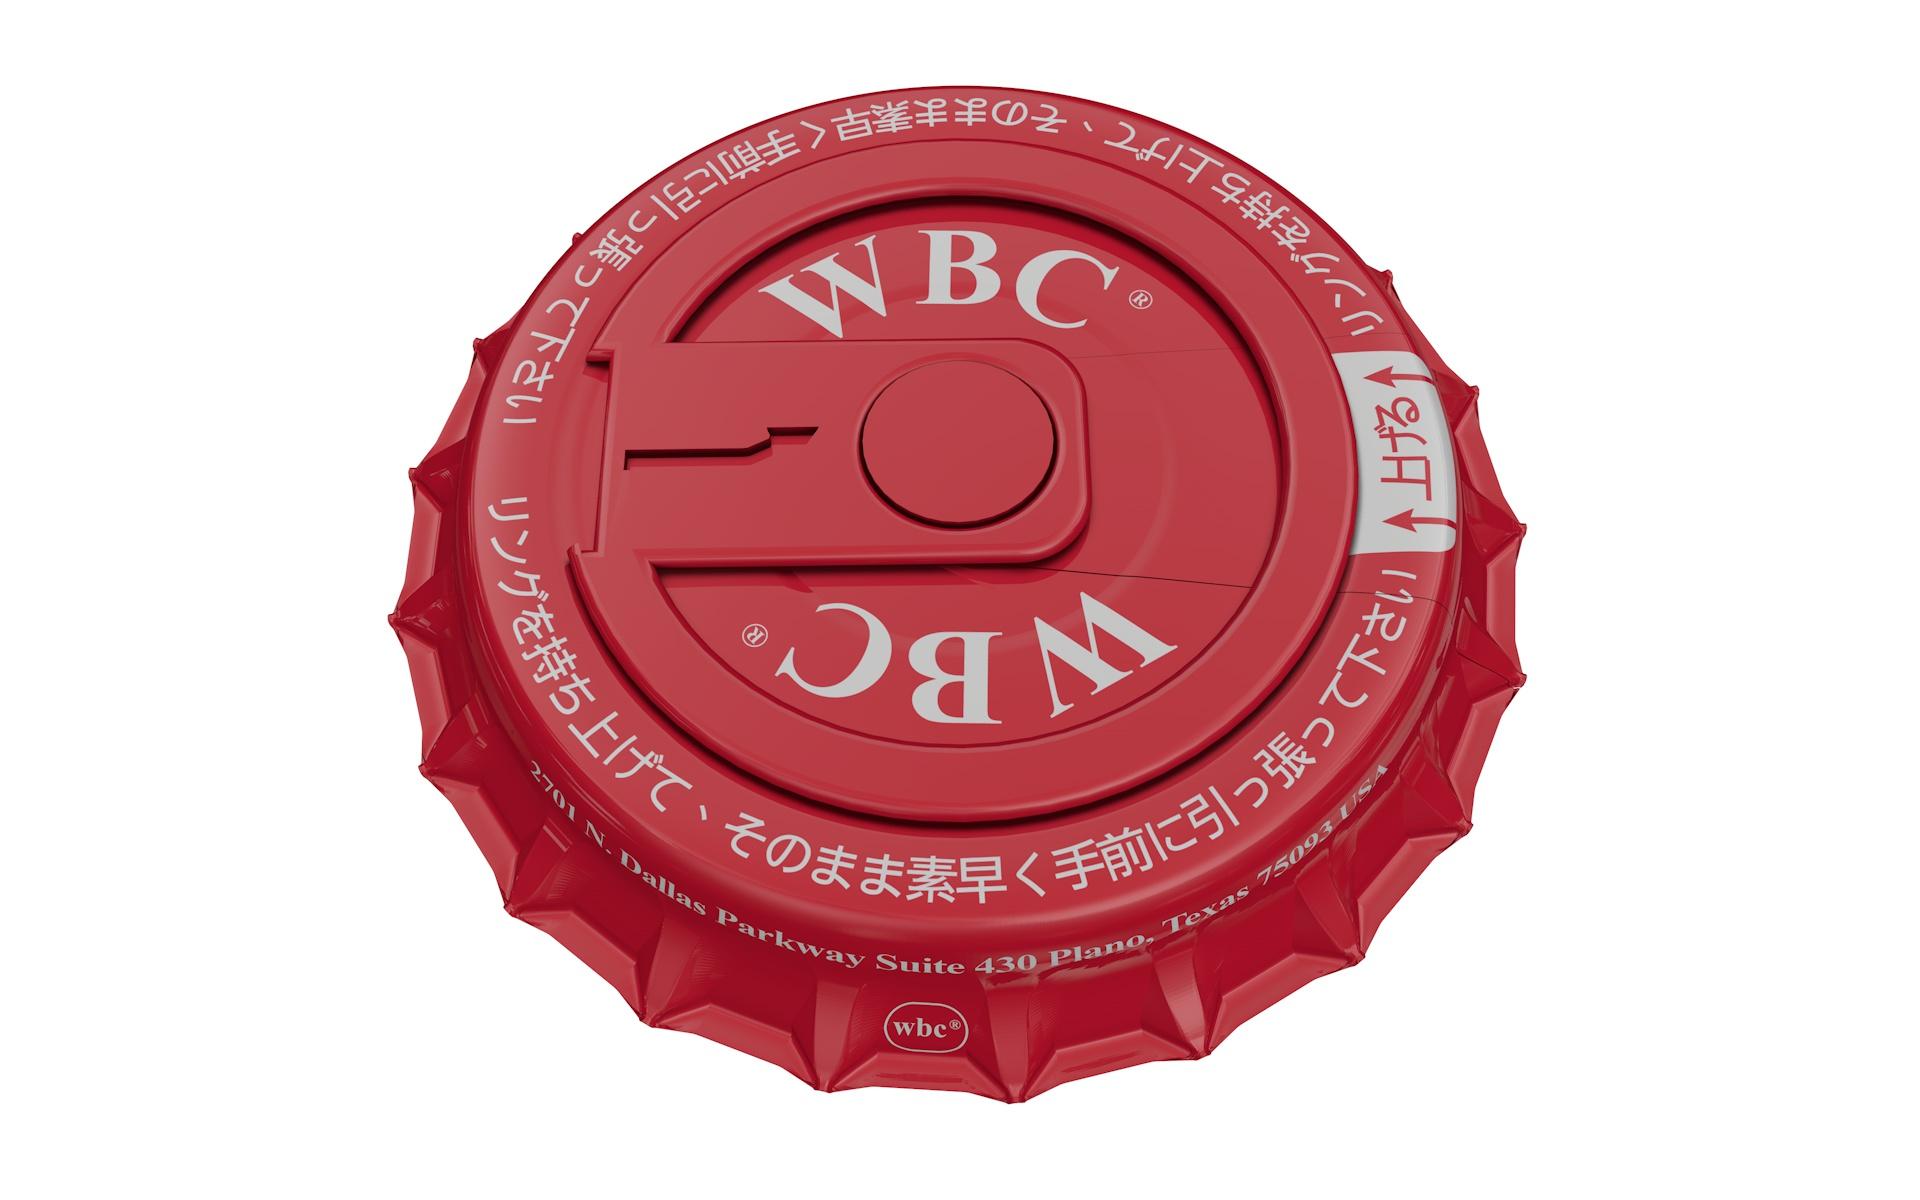 epbc-wbc-lift-ar-jpn-003_0000